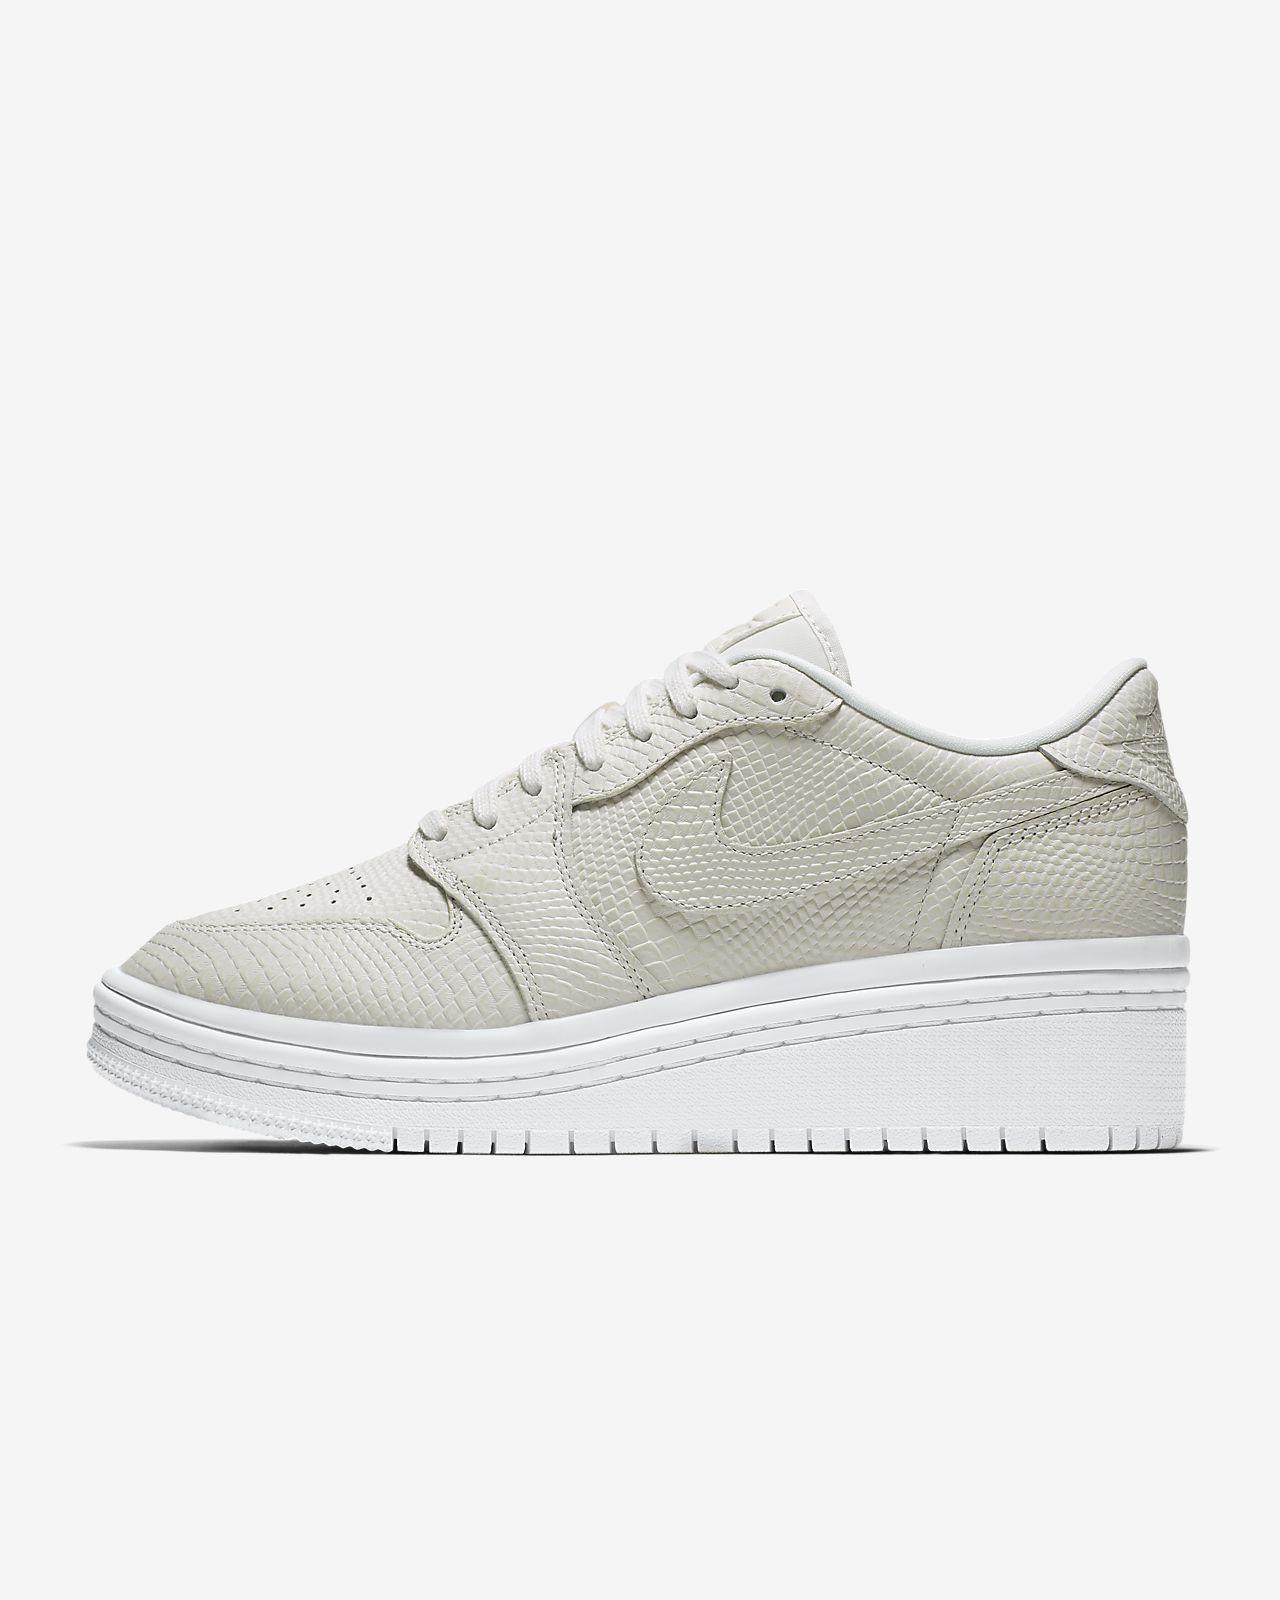 brand new cd7a4 e6ae5 Air Jordan 1 Retro Low Lifted Women's Shoe   Shoes♡   Sneakers nike ...